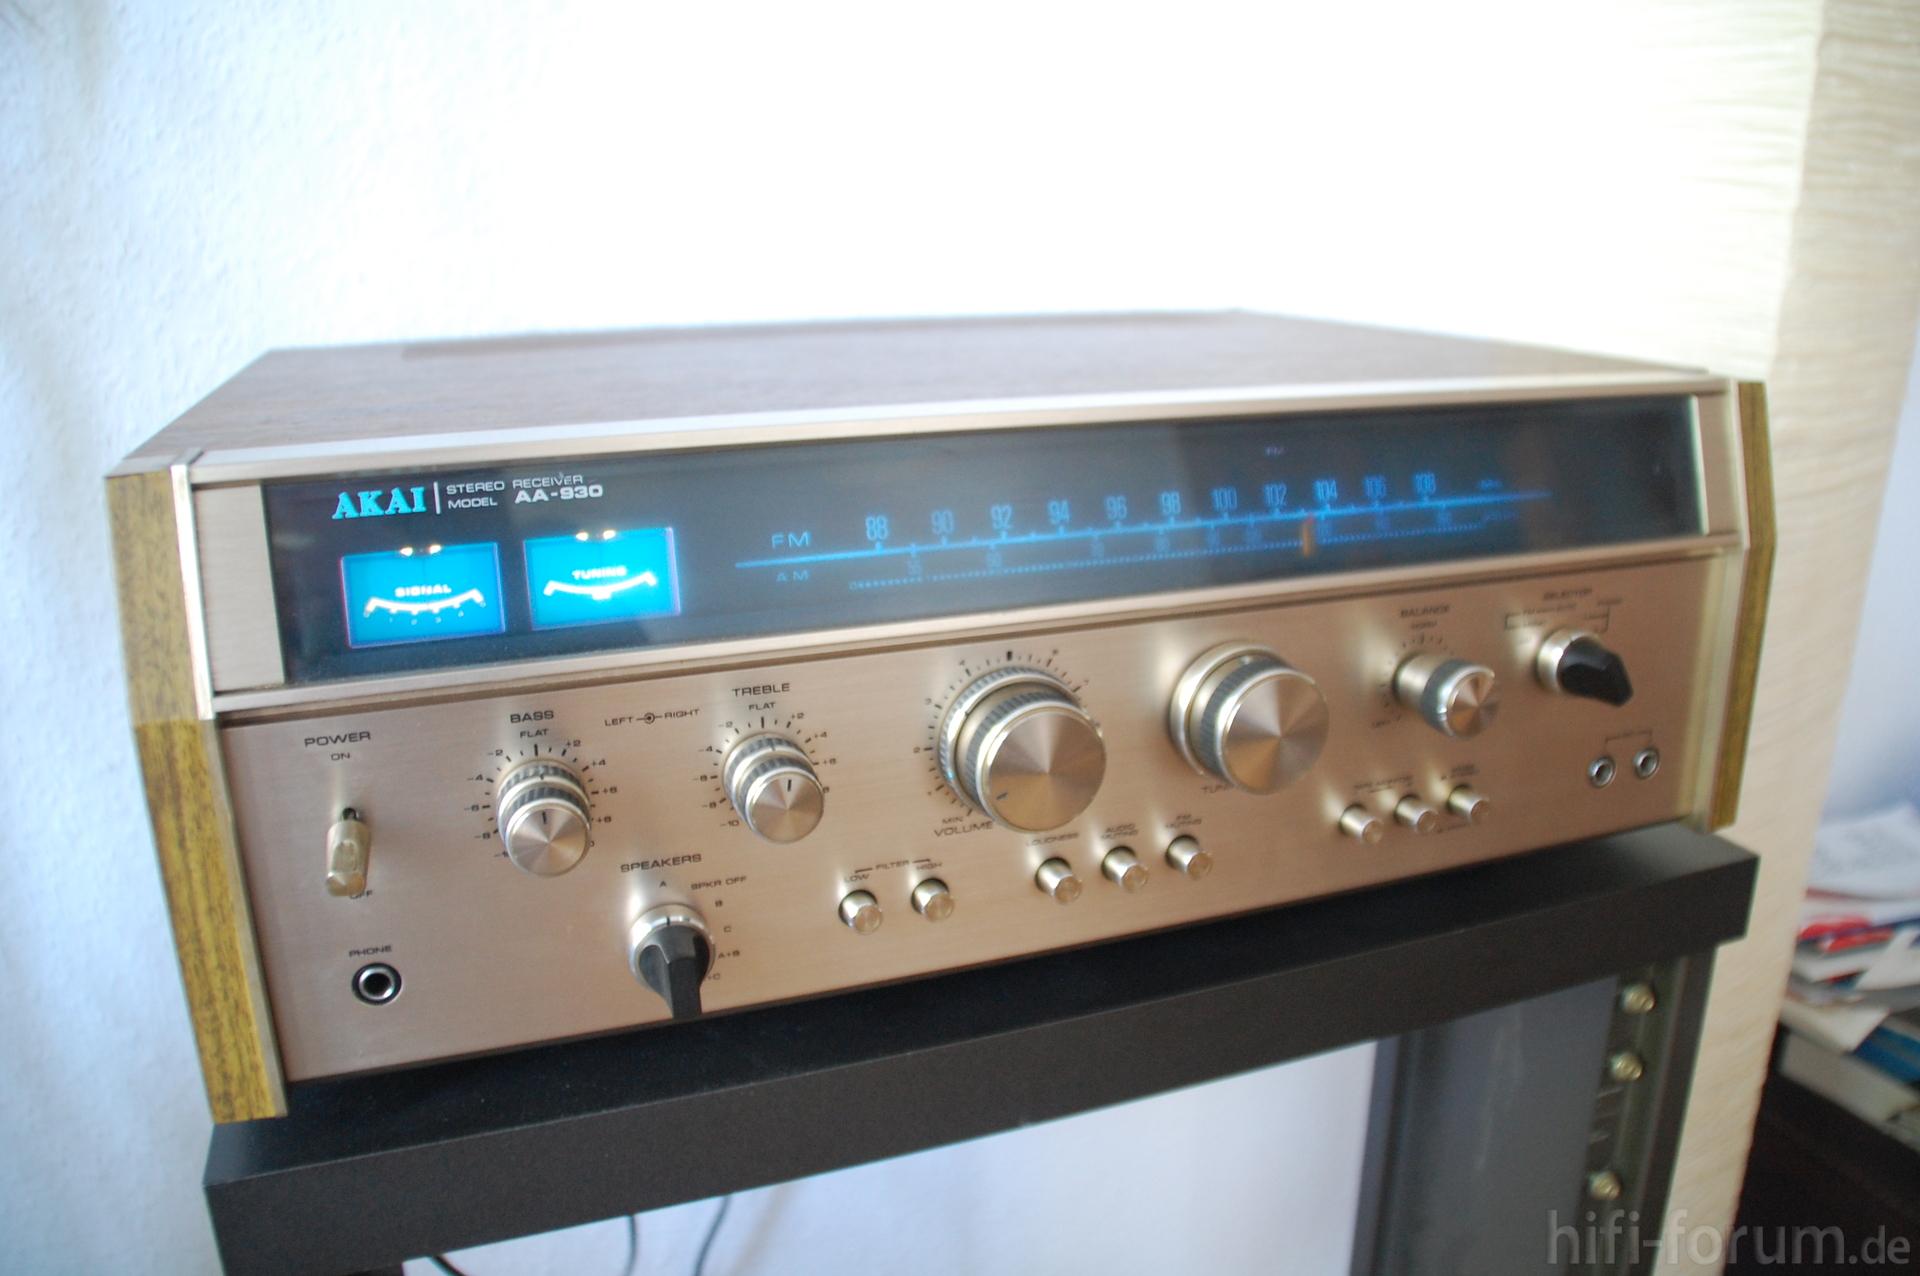 Akai Aa 930 002 Hifiklassiker Stereo Hifi